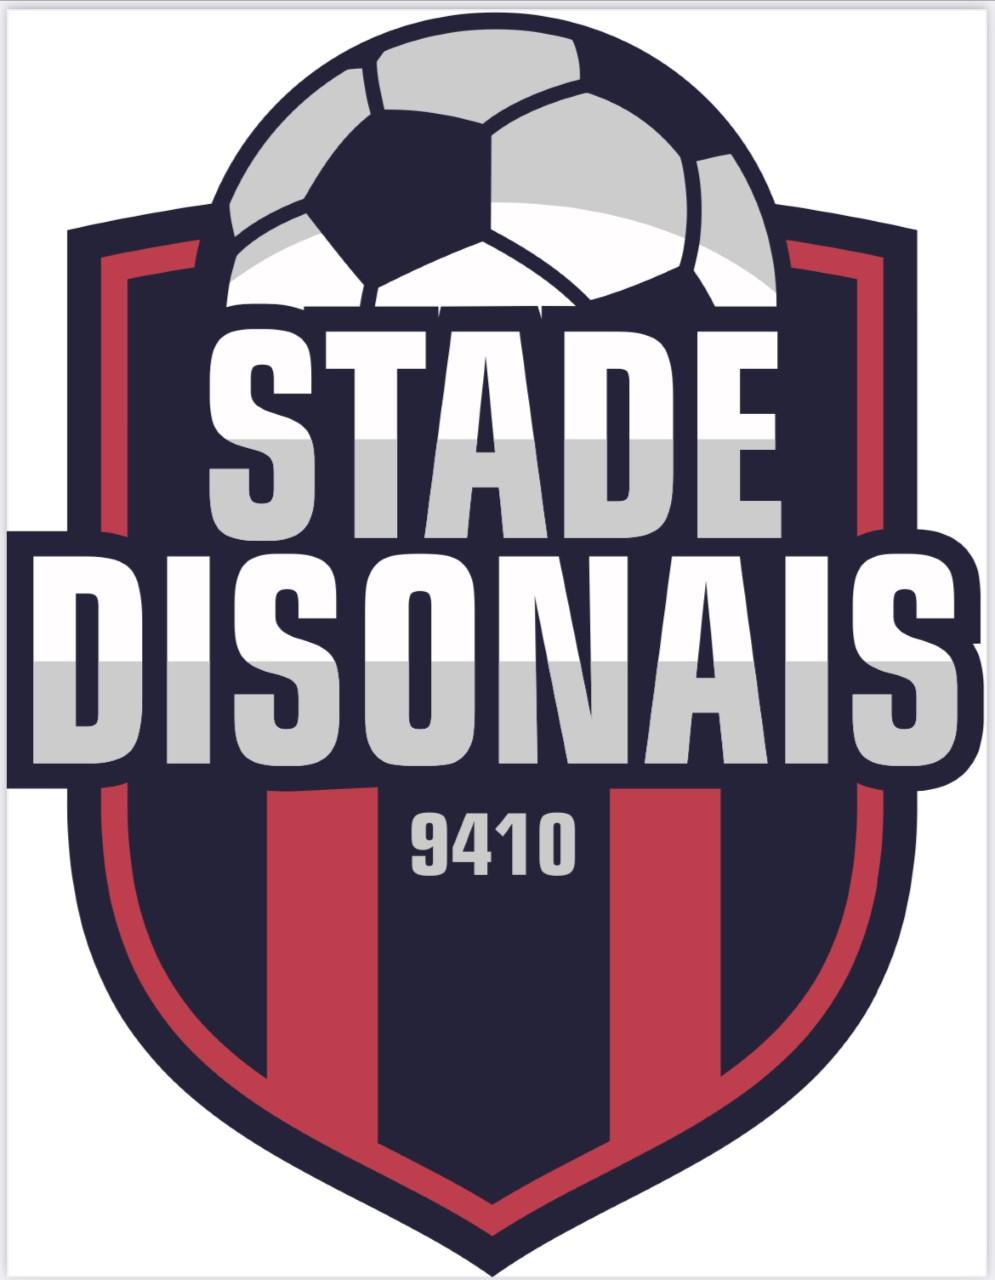 9 - Stade Disonais